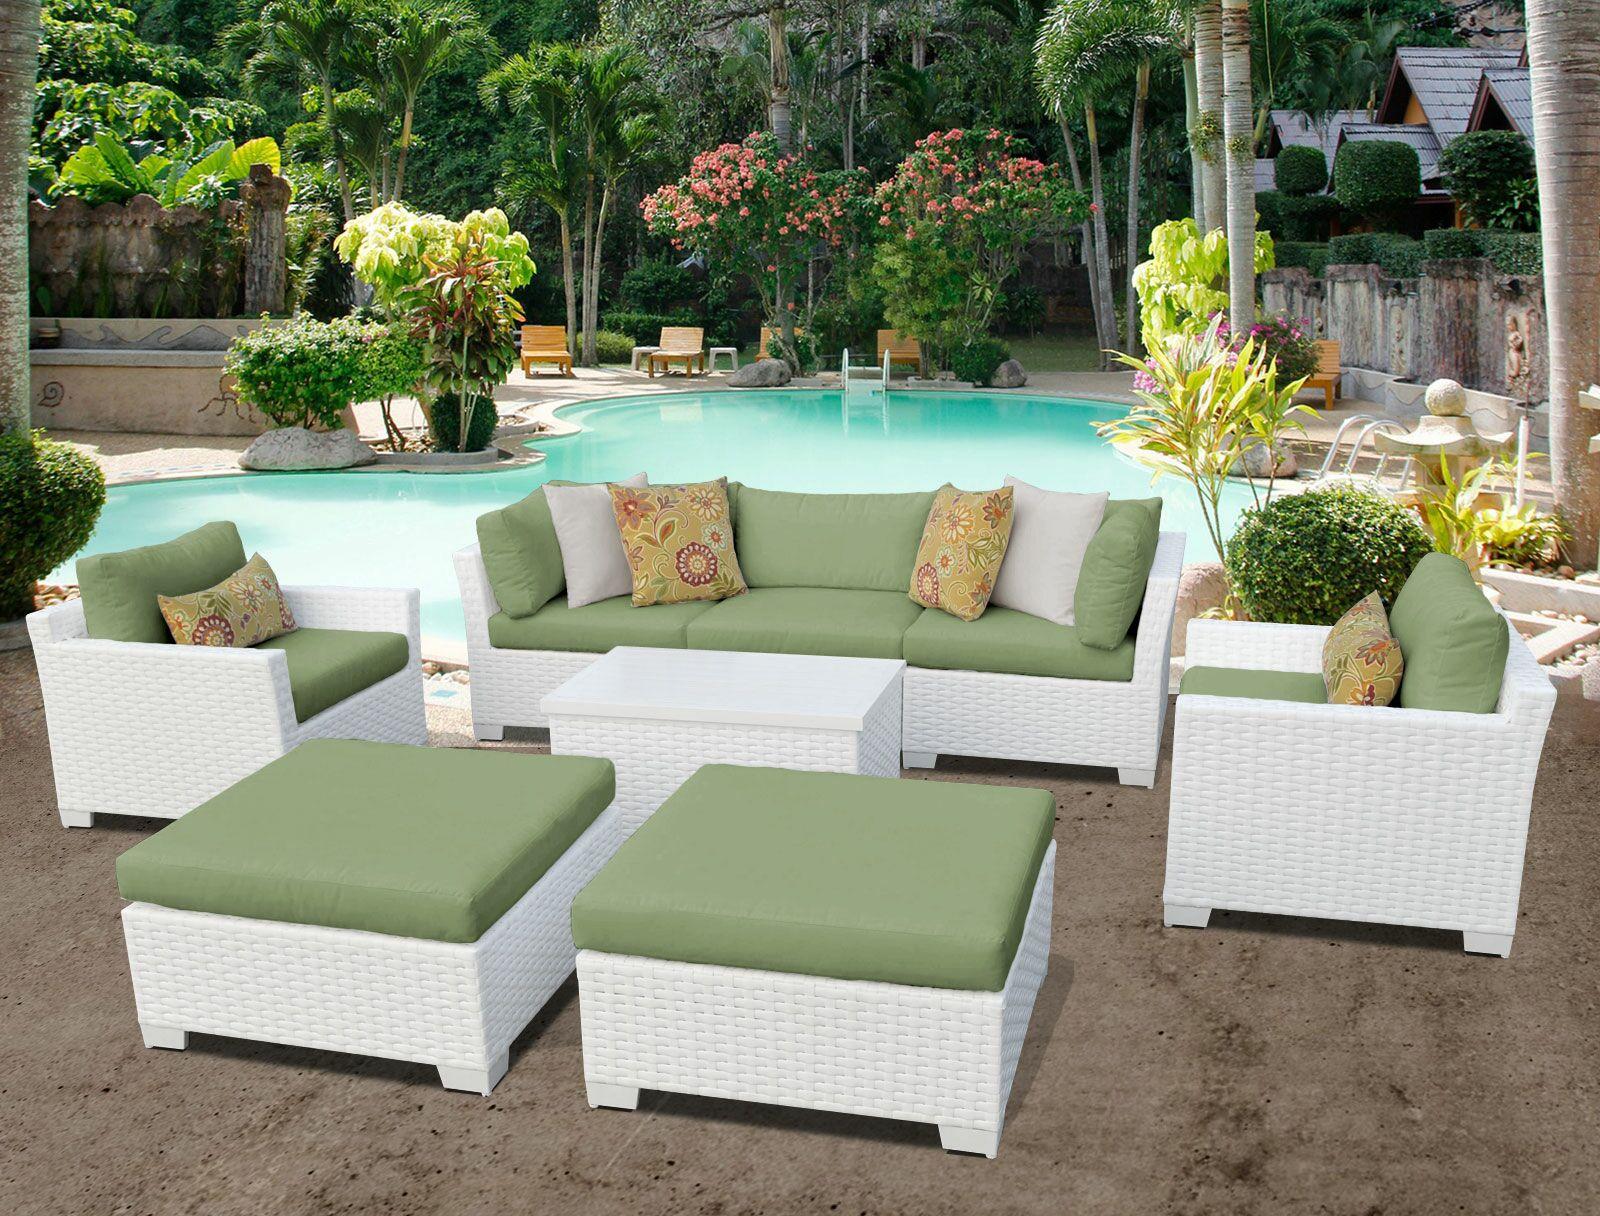 Monaco 8 Piece Sofa Set with Cushions Cushion Color (Fabric): Cilantro